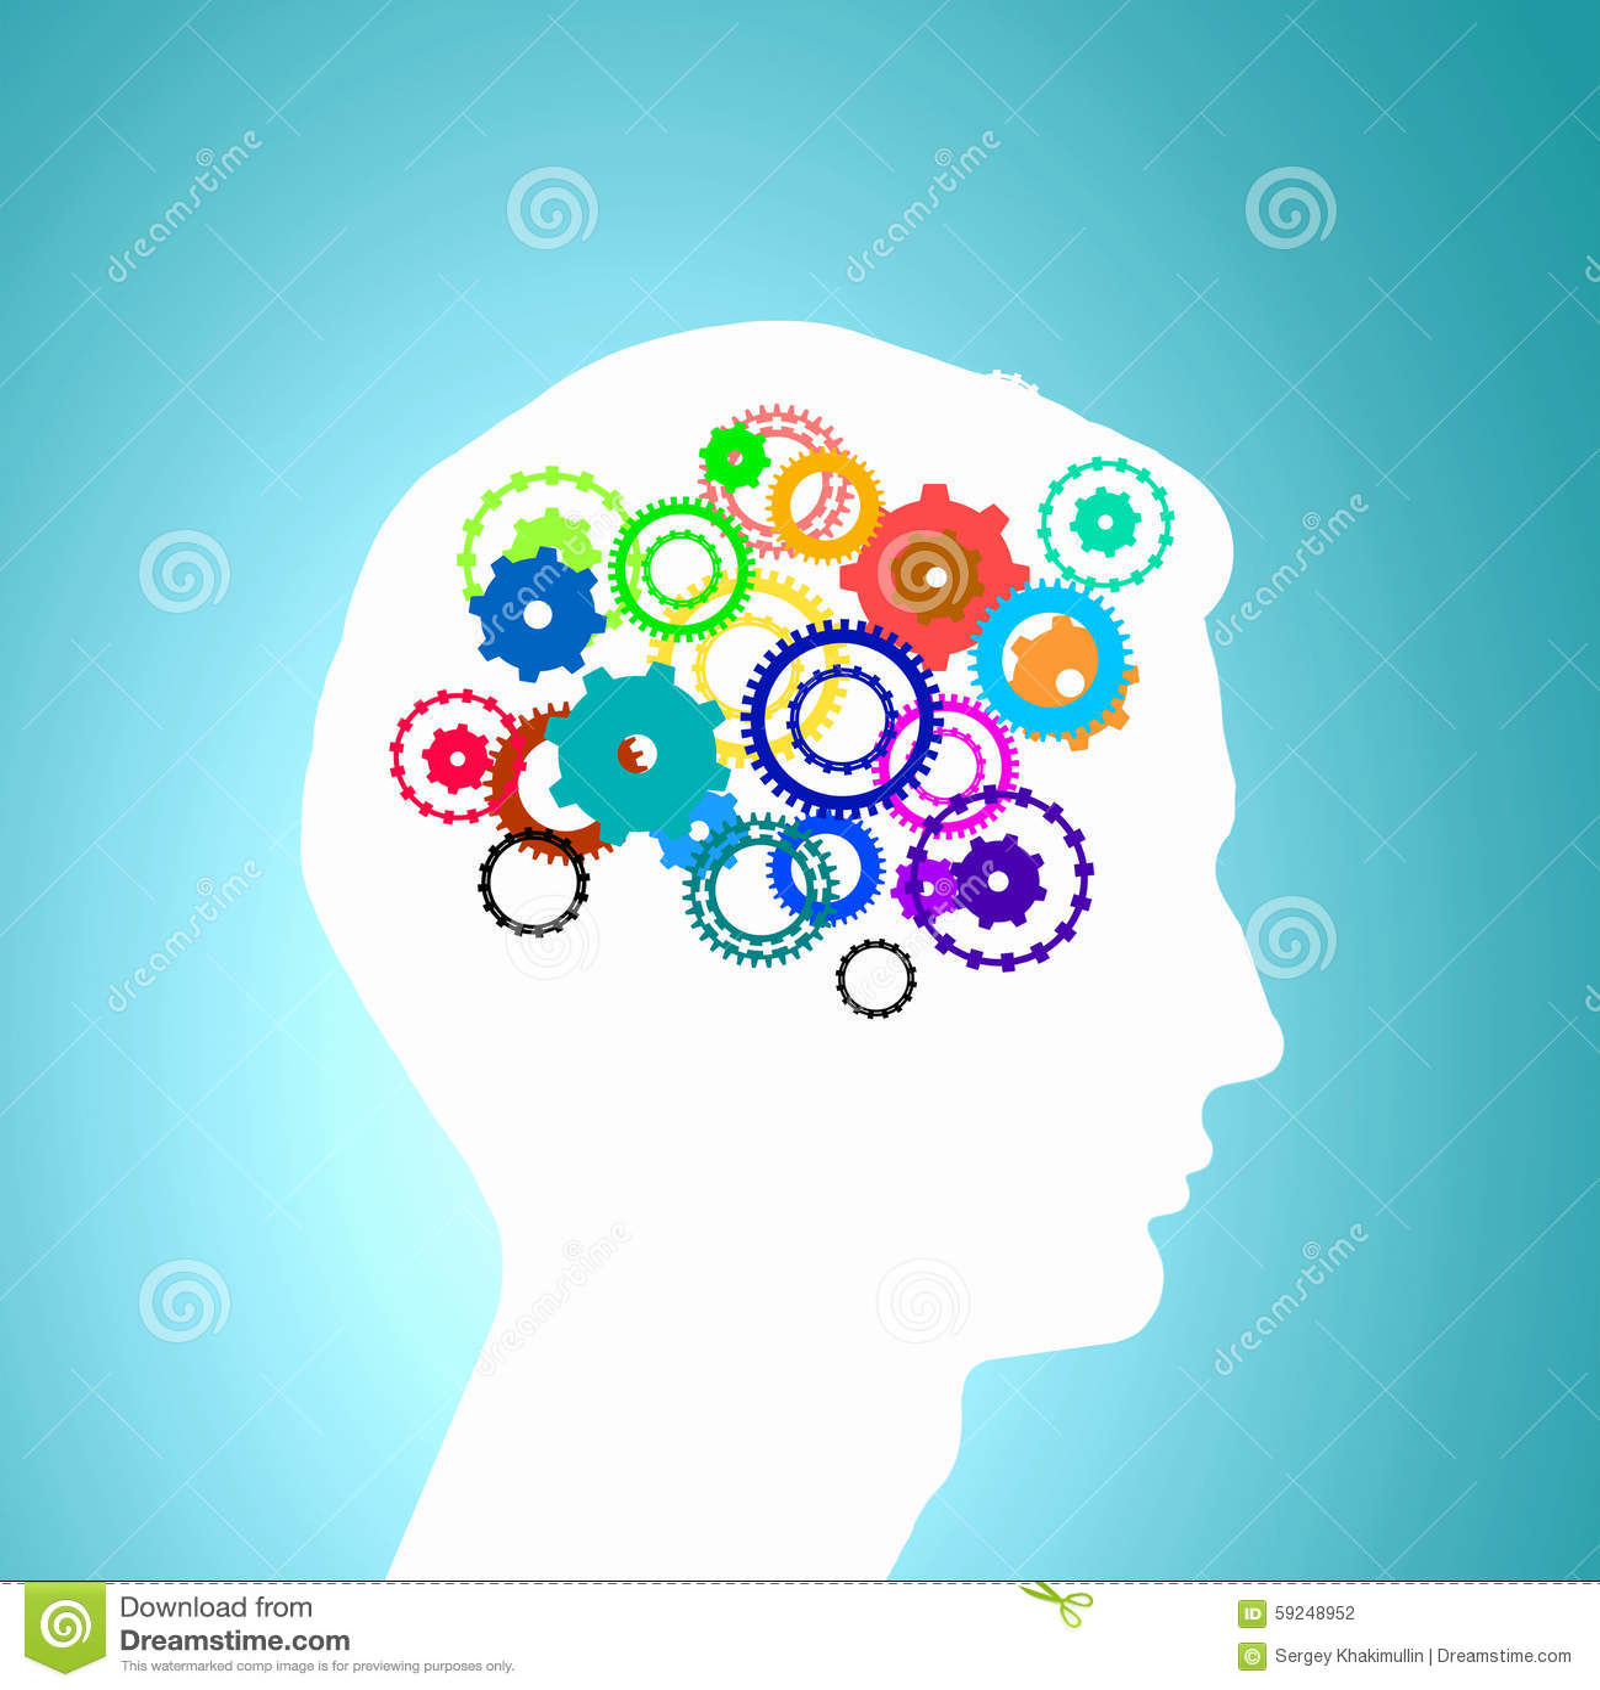 Mecanismos de pensamiento